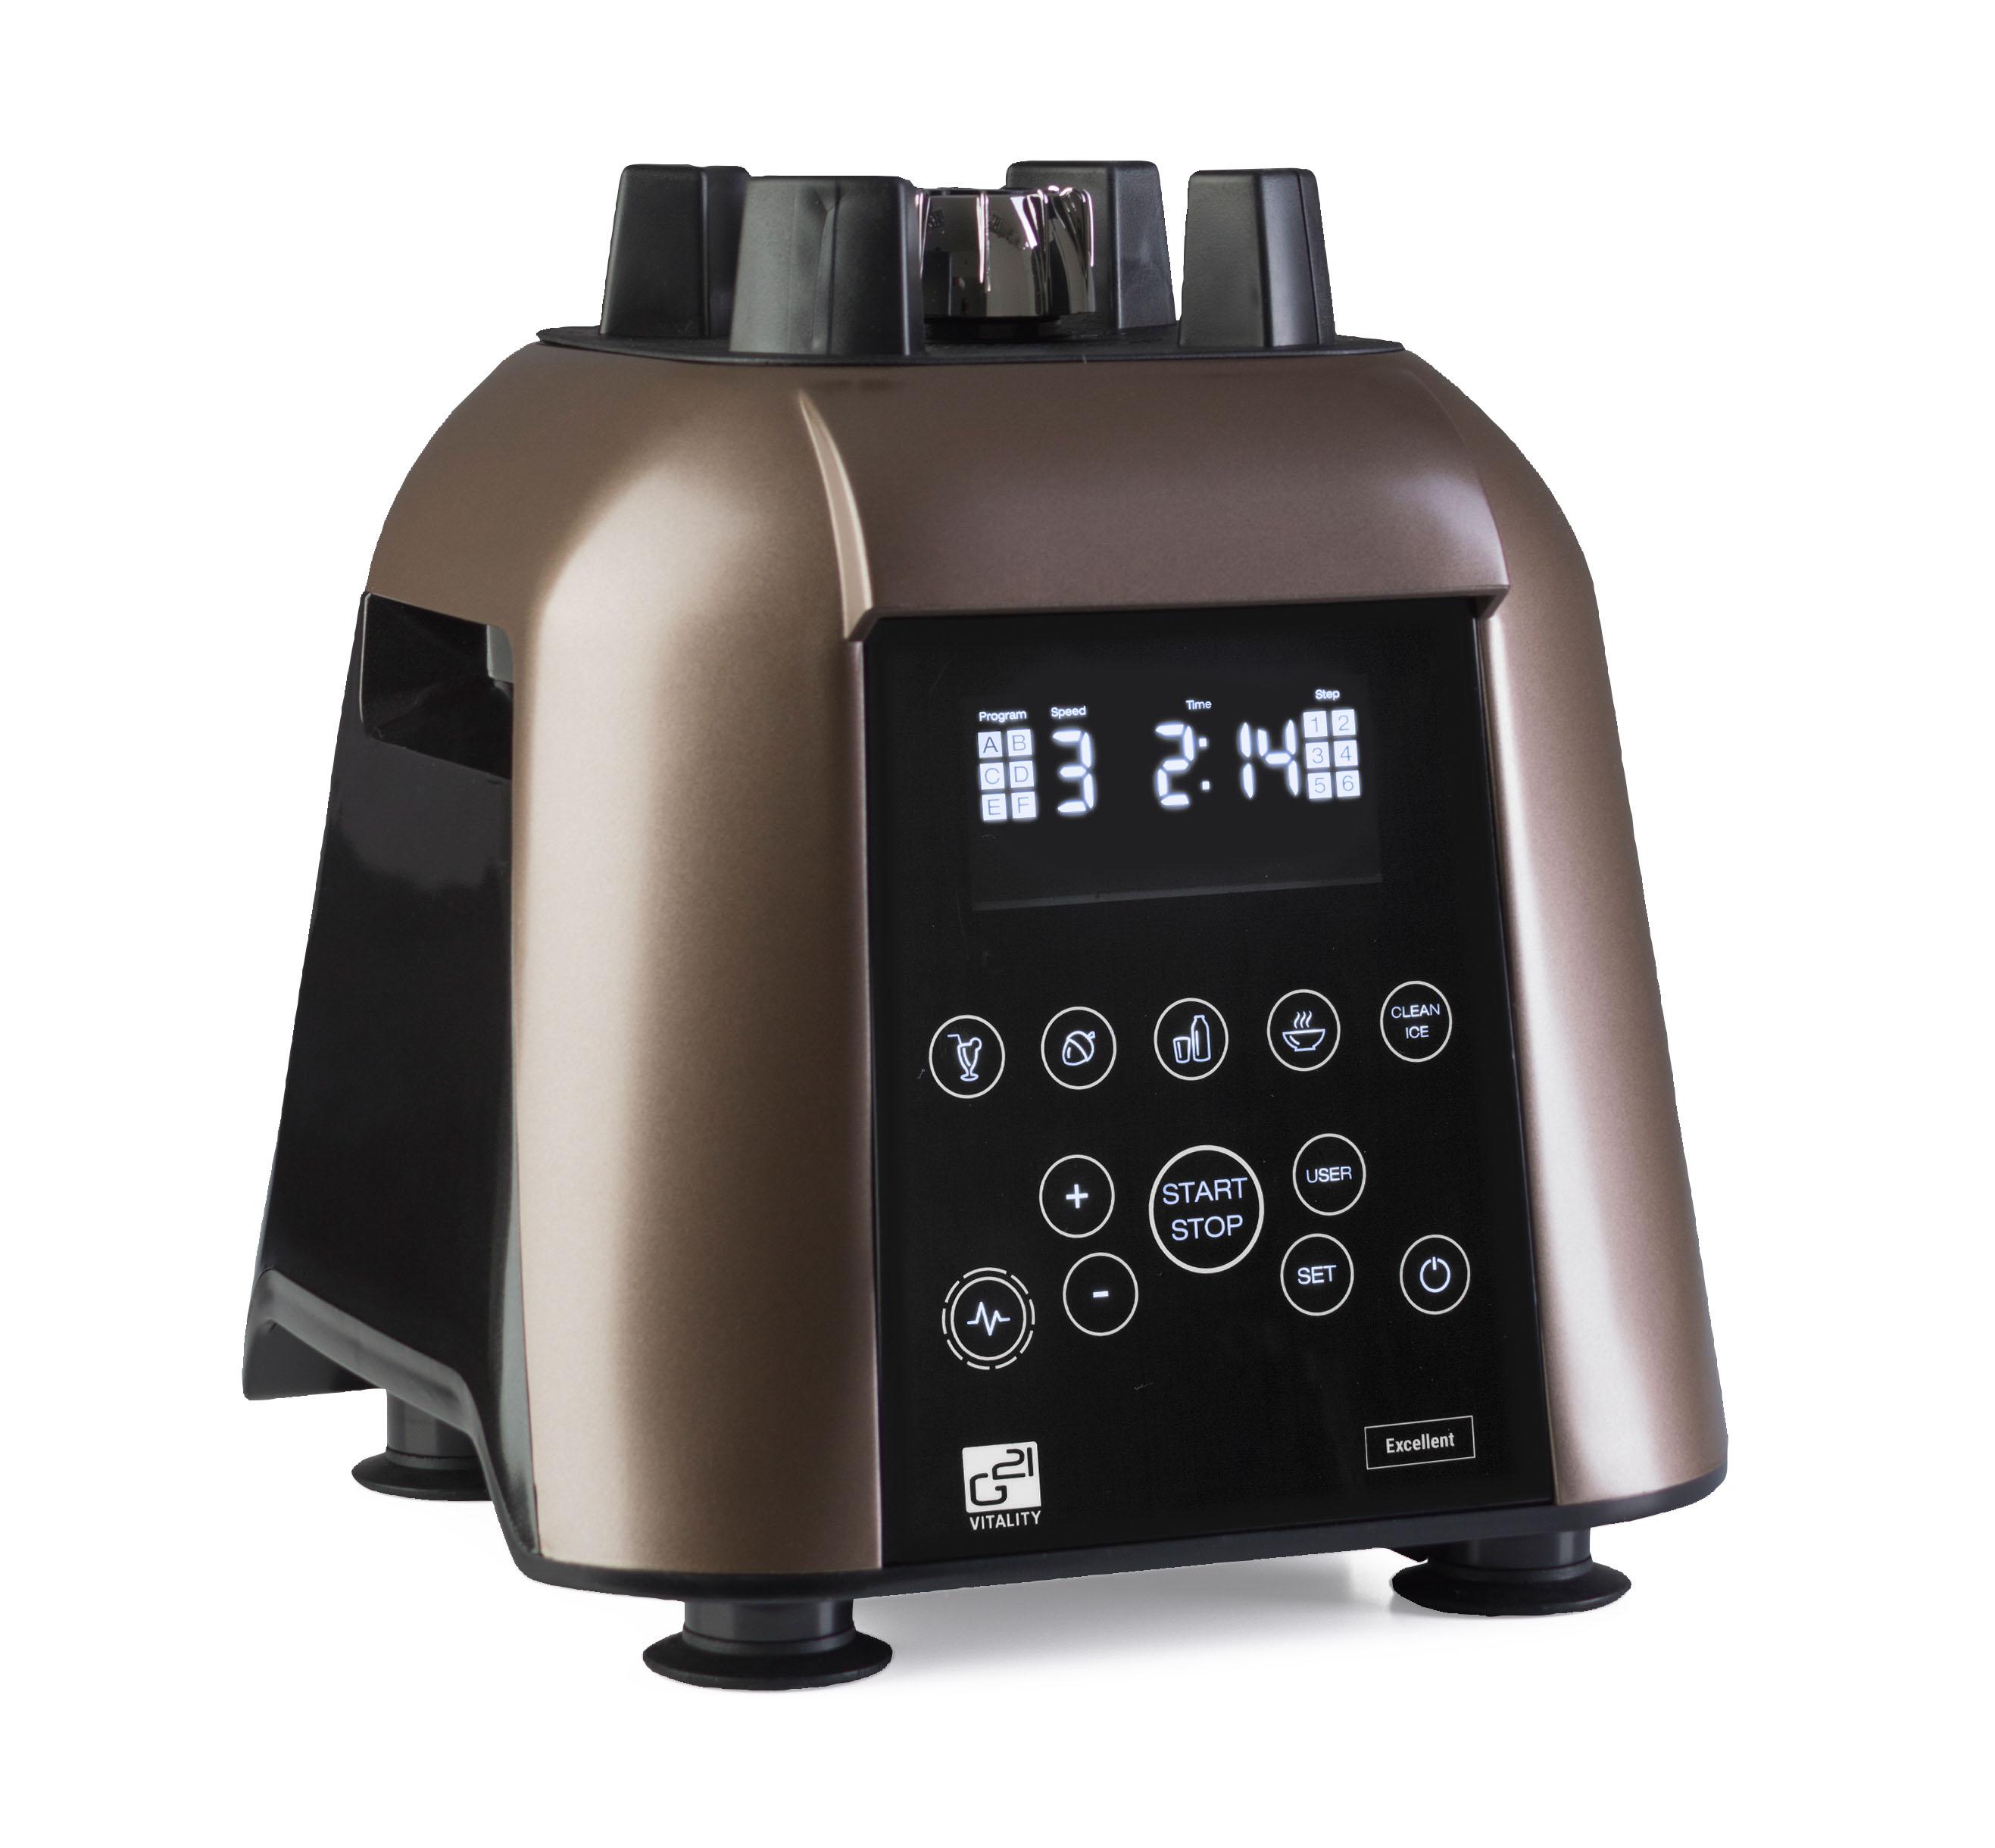 Telo mixéra G21 Excellent s dotykovým ovládaním a displejom